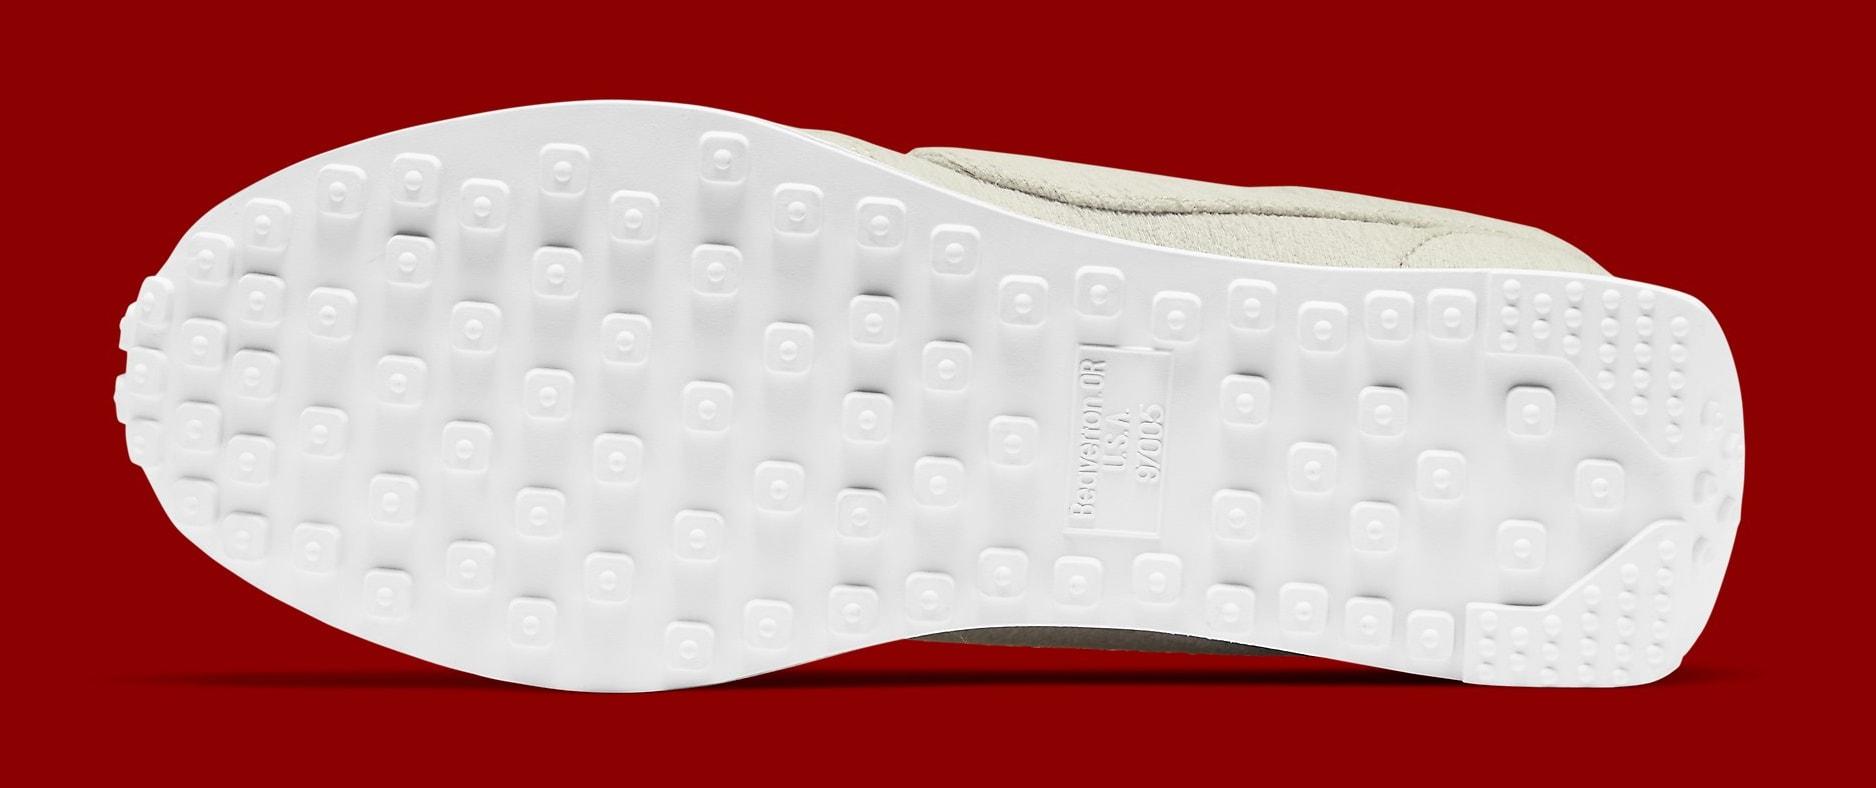 Stranger Things x Nike Tailwind 79 'Starcourt Mall' CJ6110-100 Sole